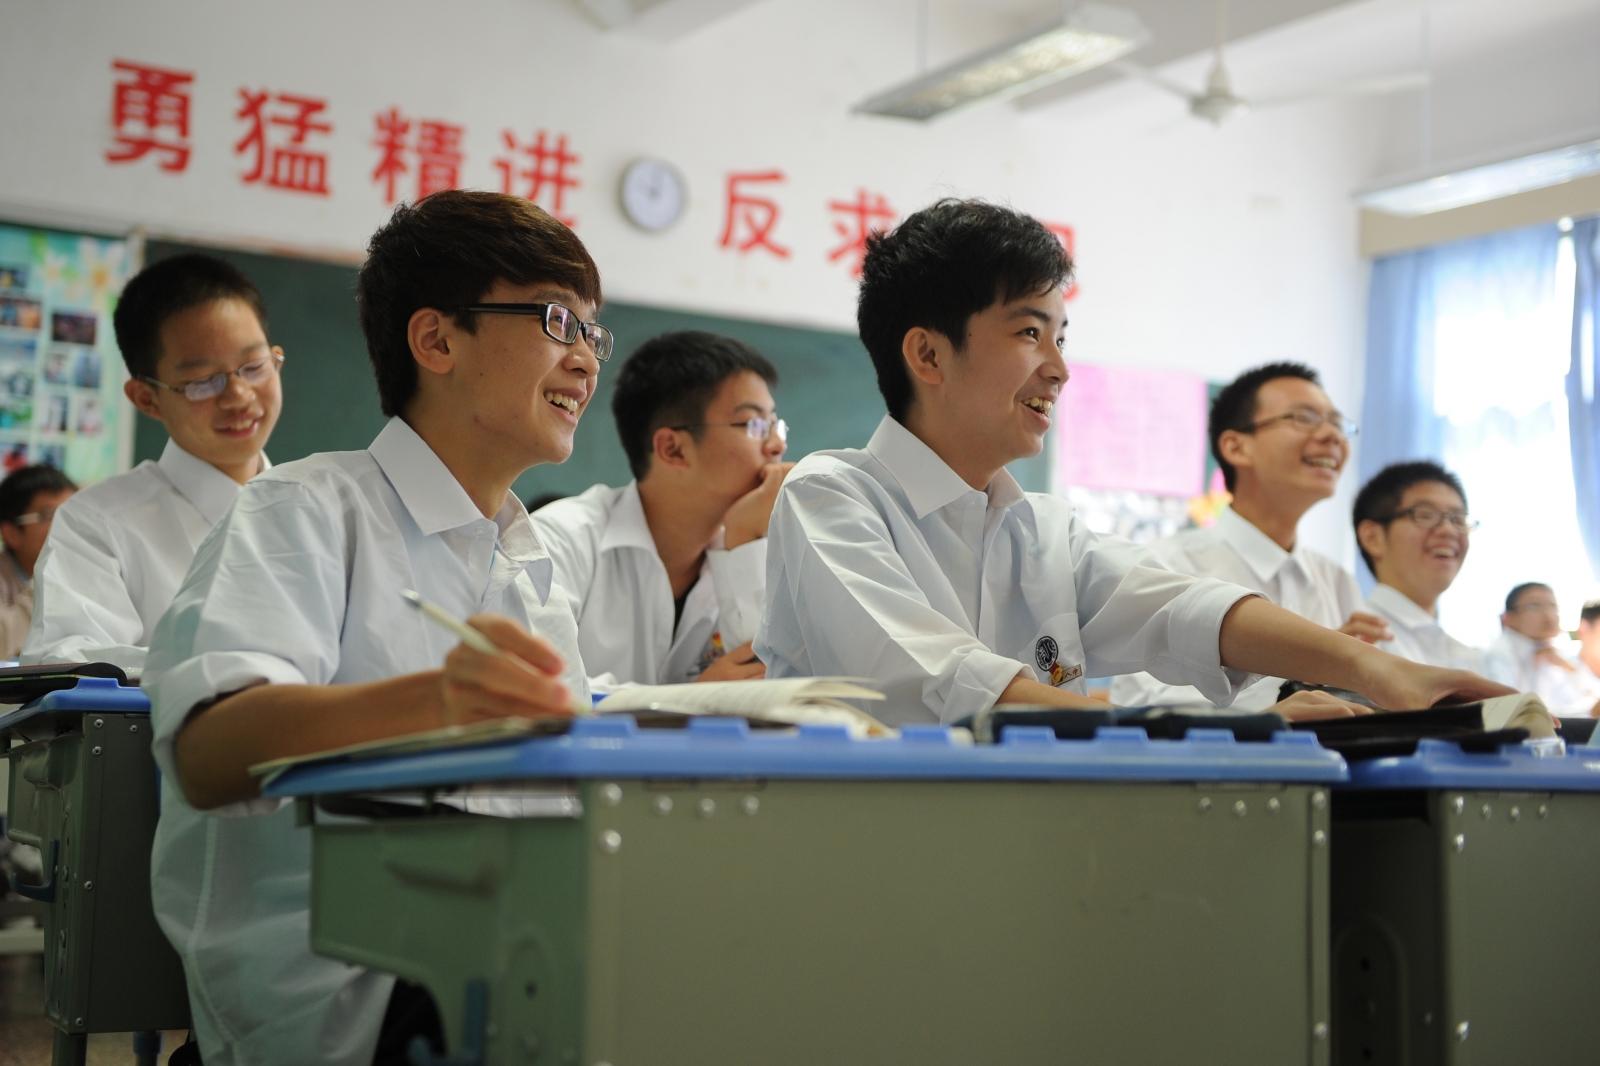 China education